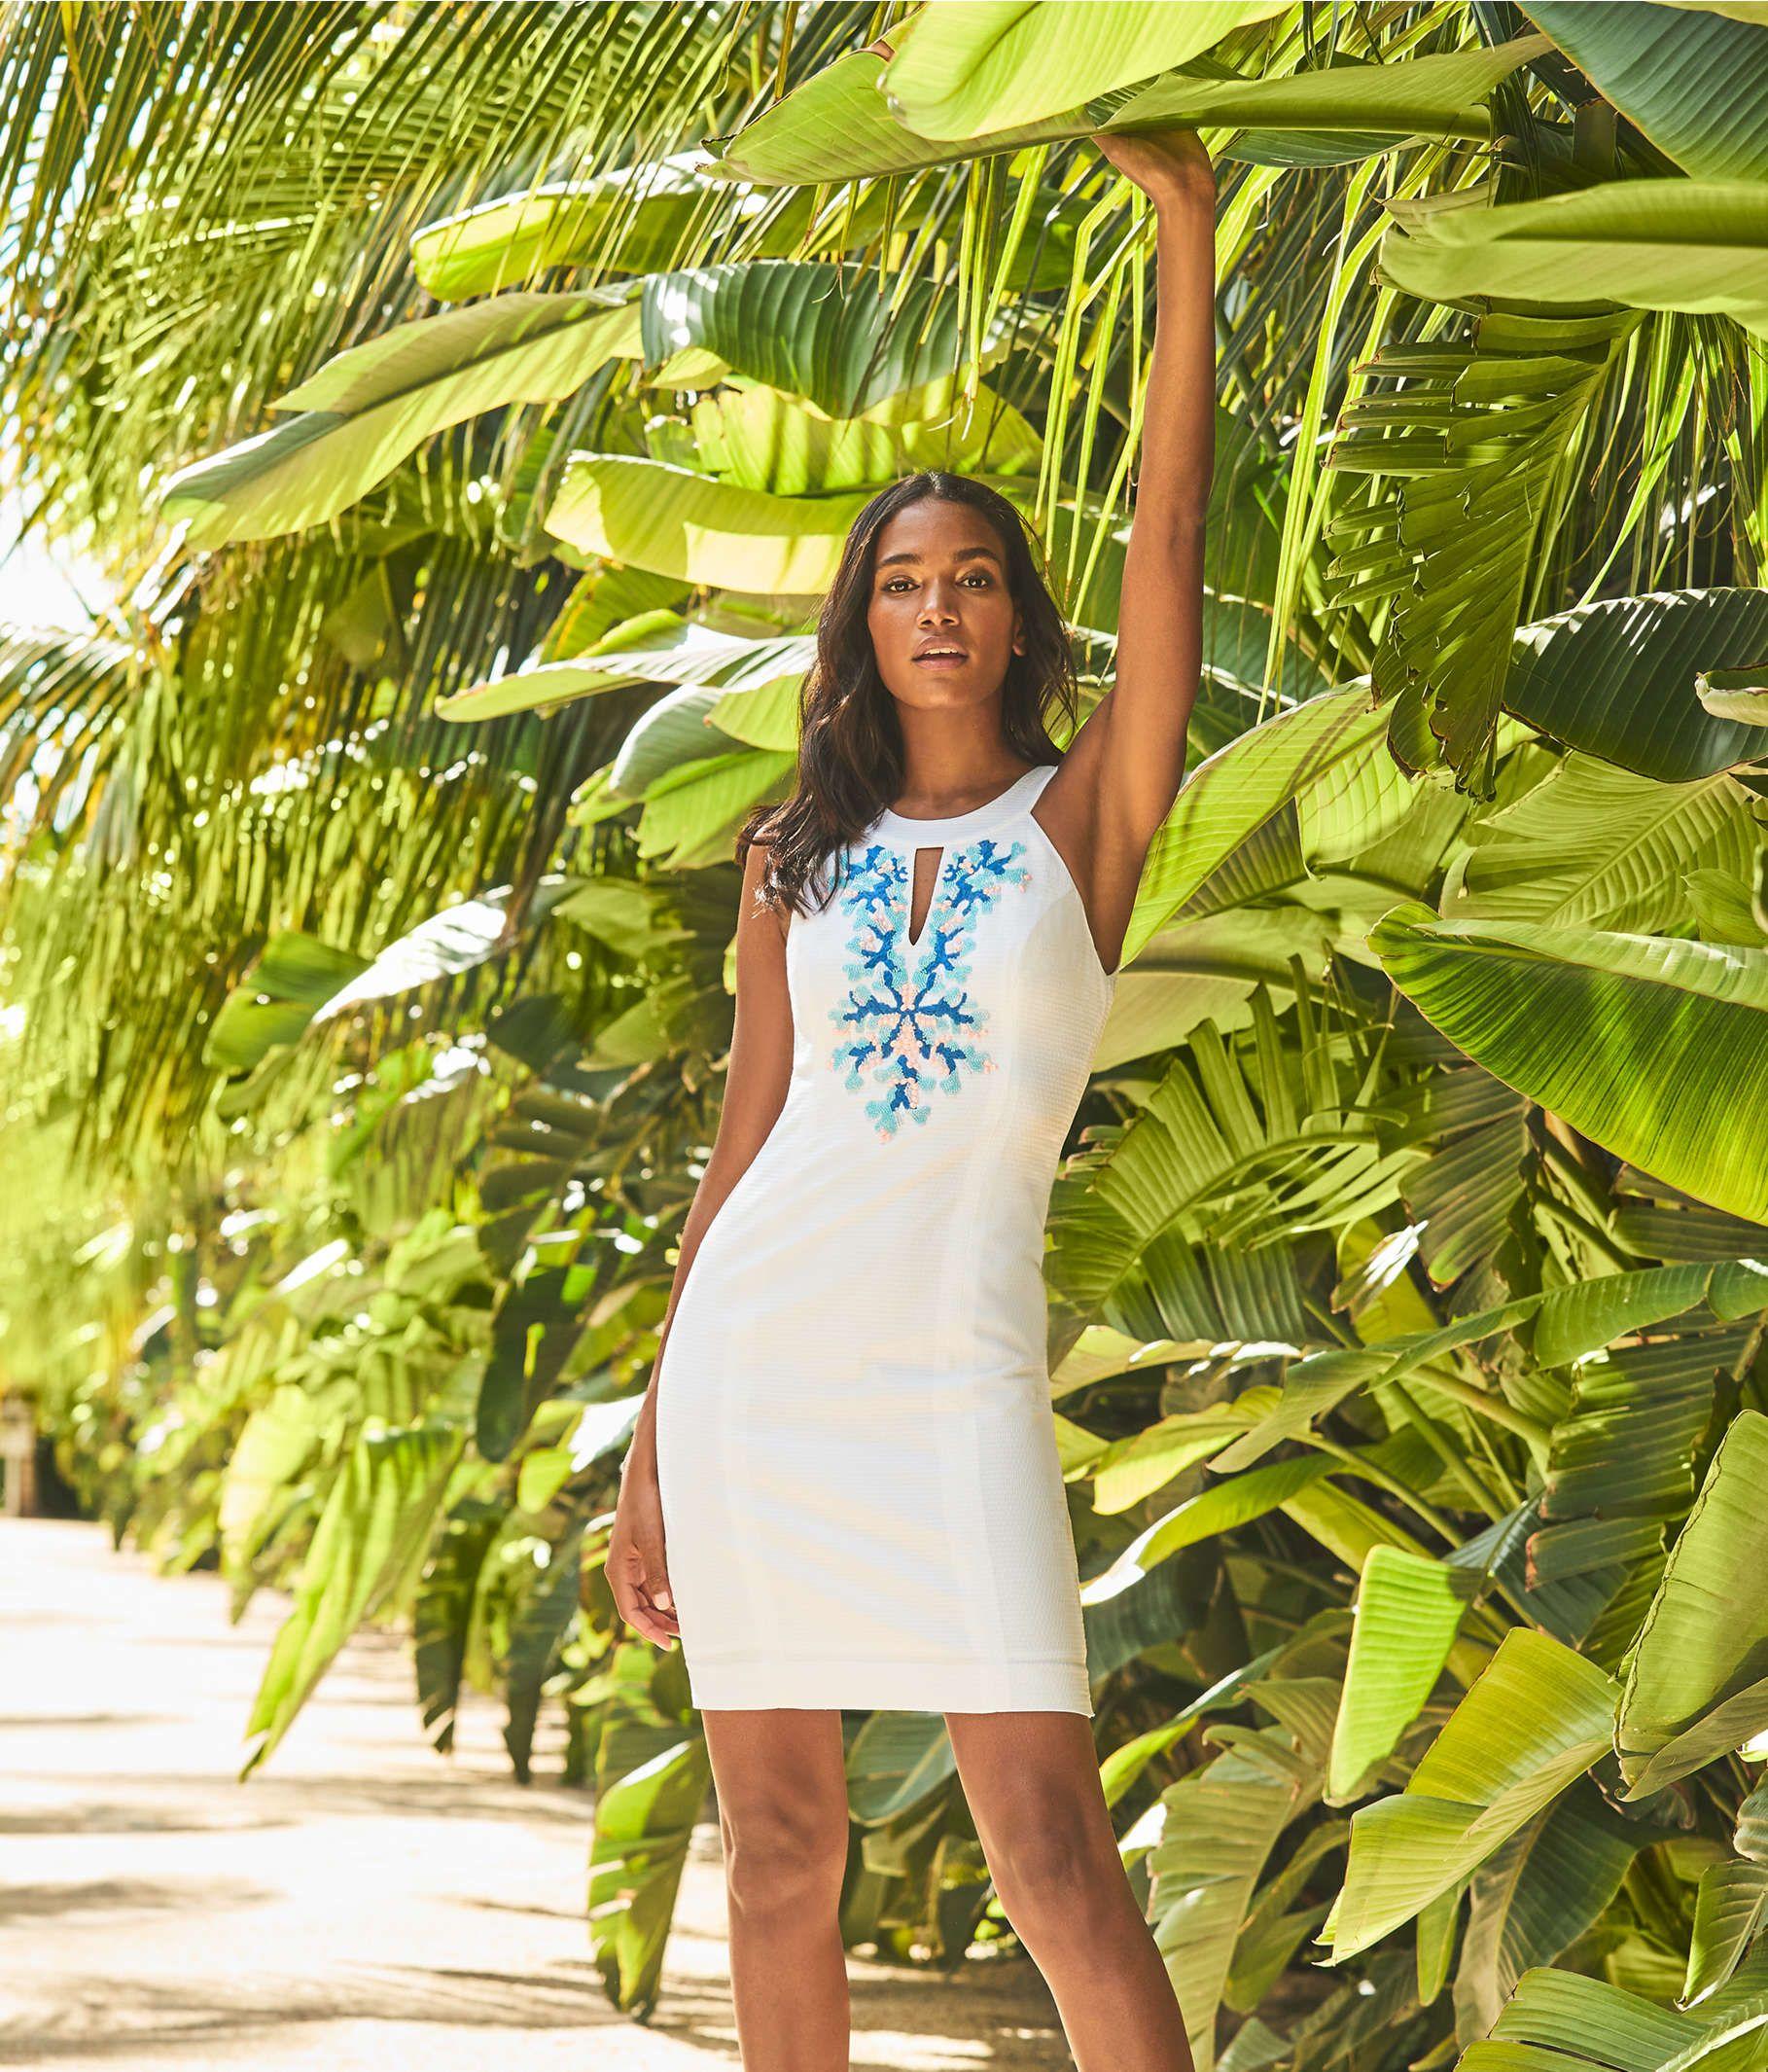 Jena Stretch Shift Dress 002239 Lilly Pulitzer Dresses Shift Dress Fashion [ 2130 x 1818 Pixel ]